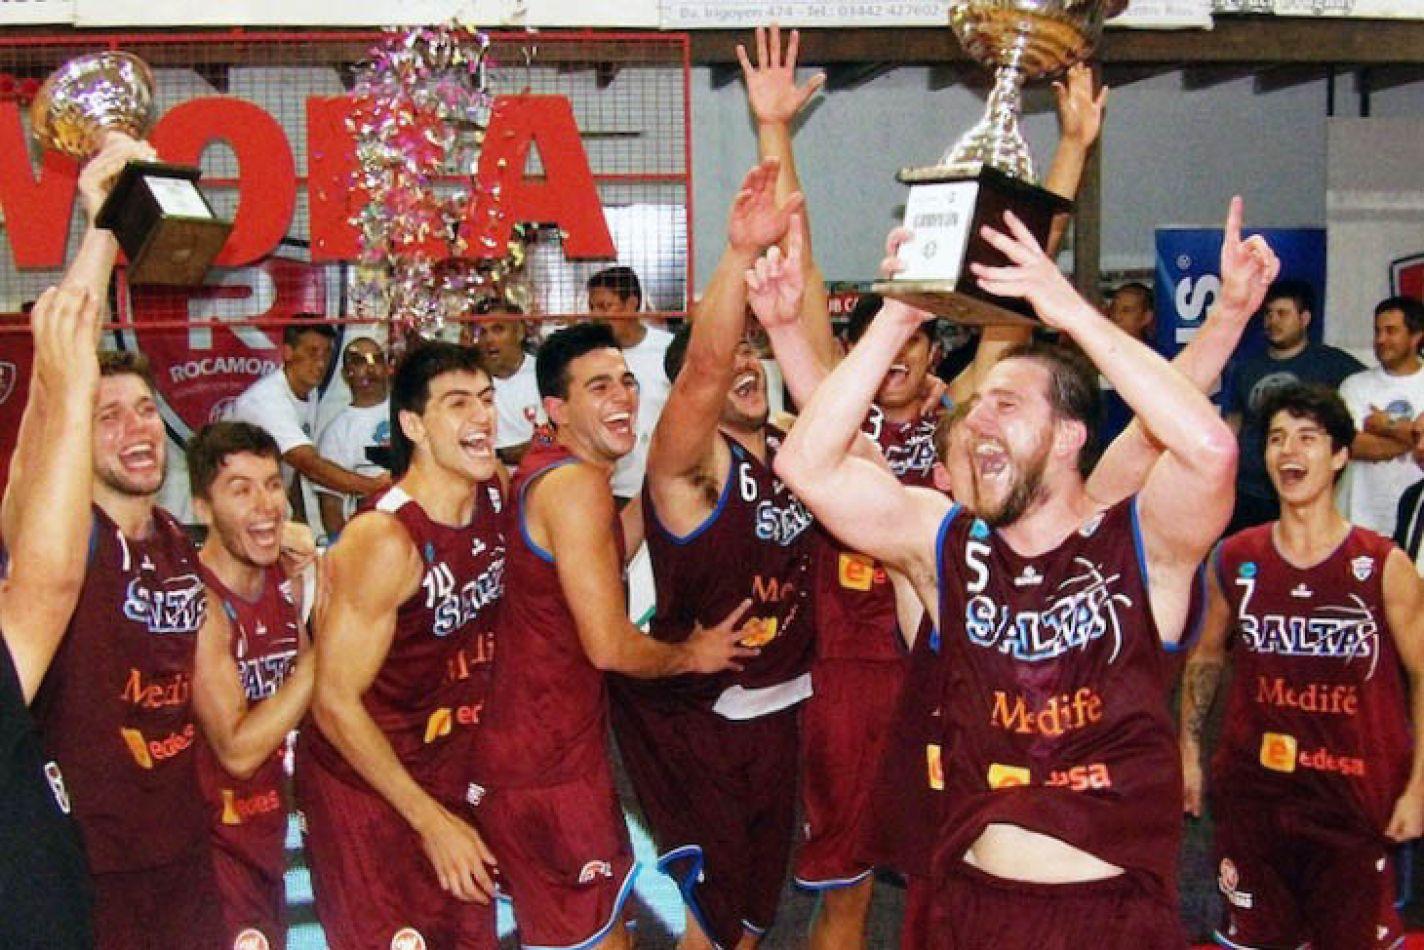 Festeja Salta Basket